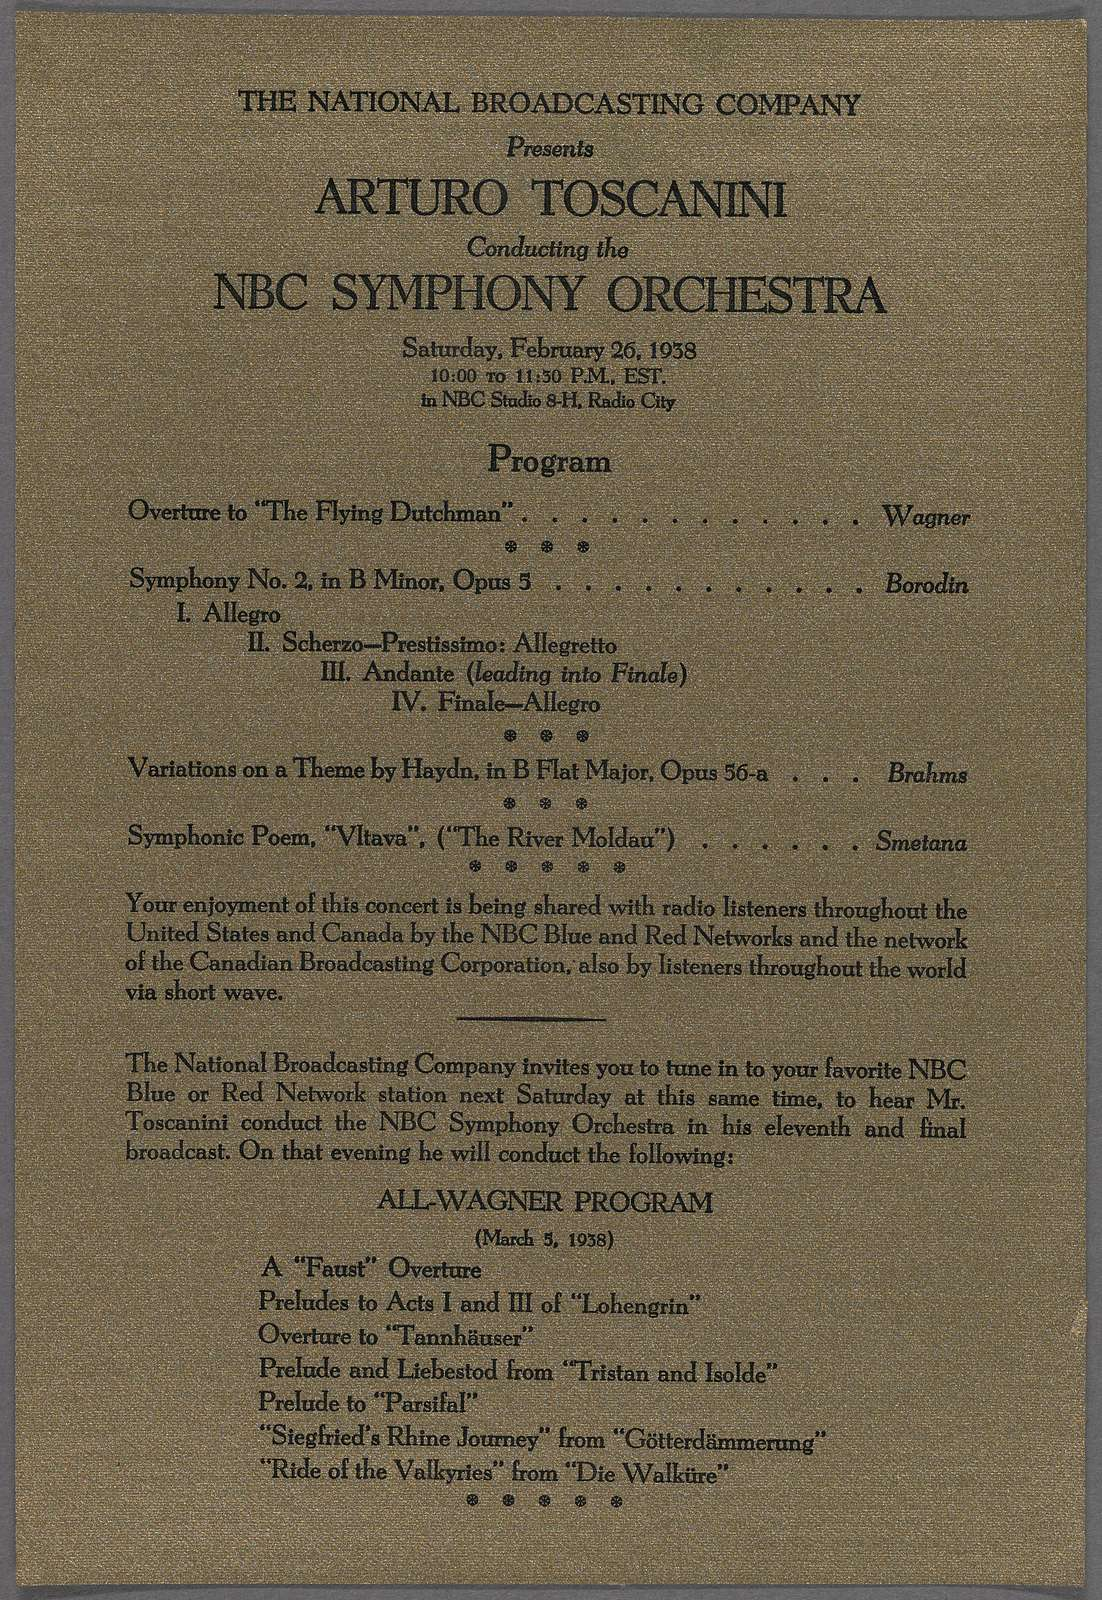 The National Broadcasting Company Present Arturo Toscanini conducting the NBC Symphony Orchestra